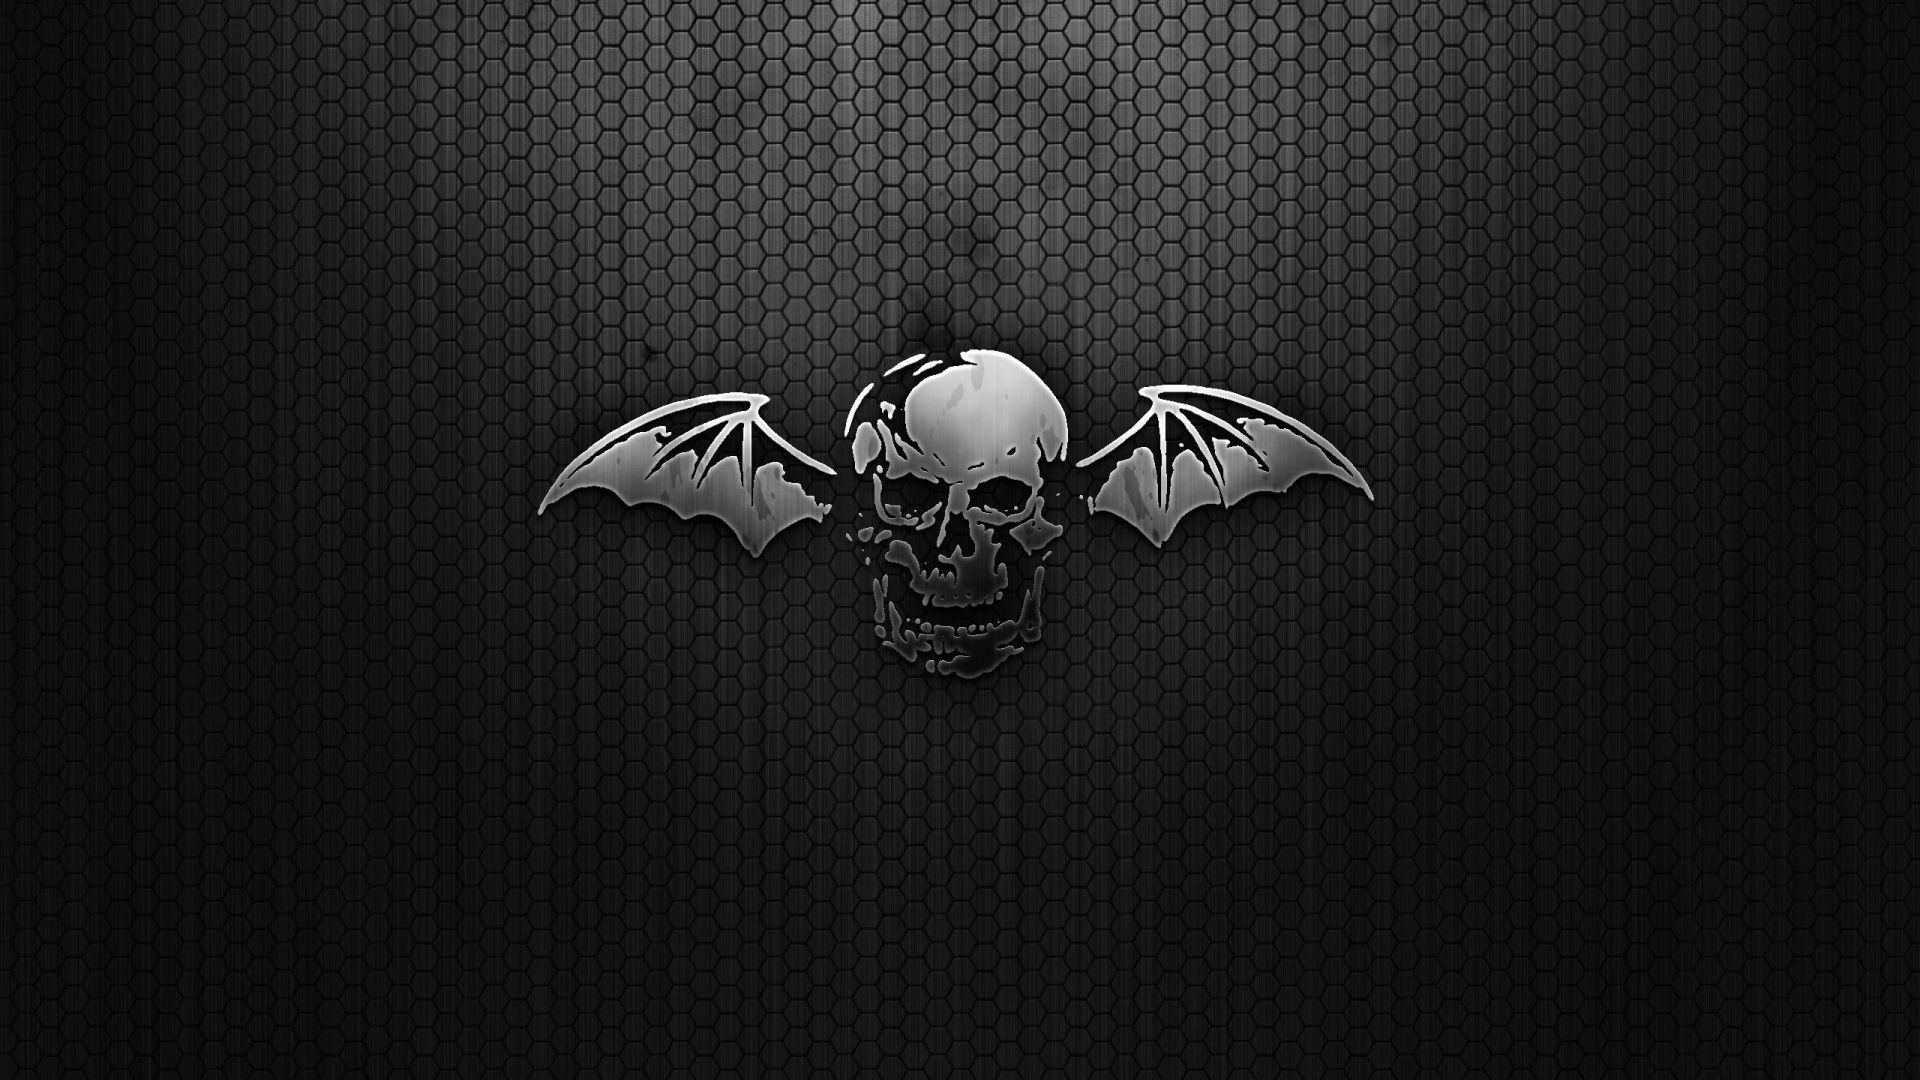 Wallpaper black wallpapers hd hd wallpapers pinterest dark wallpaper black wallpapers hd voltagebd Choice Image